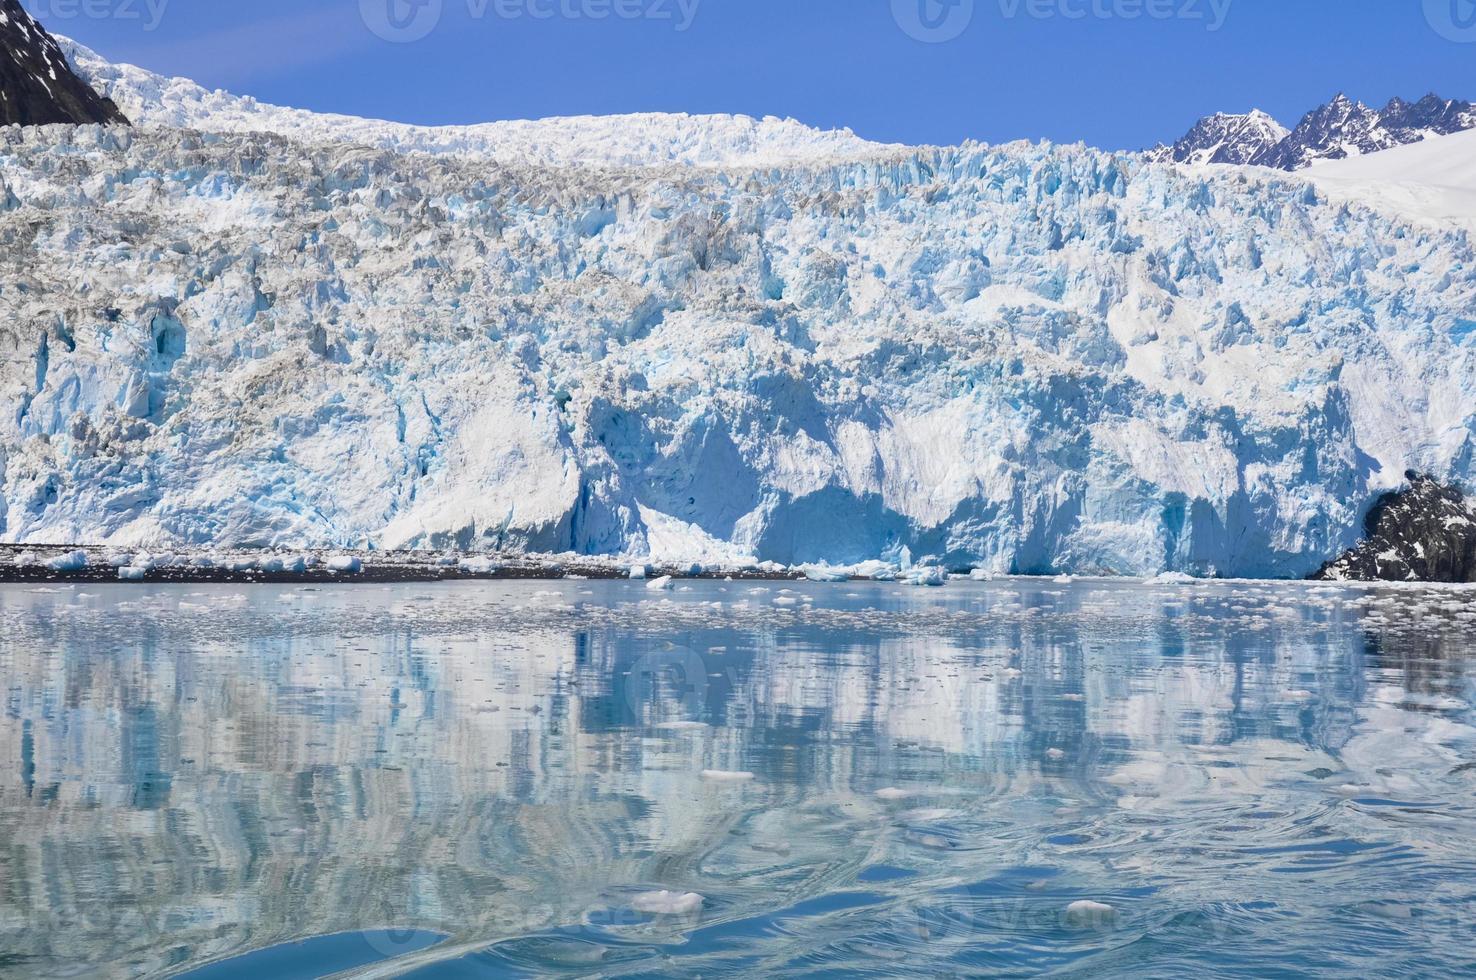 aialik gletsjer, kenai fjords national park (alaska) foto